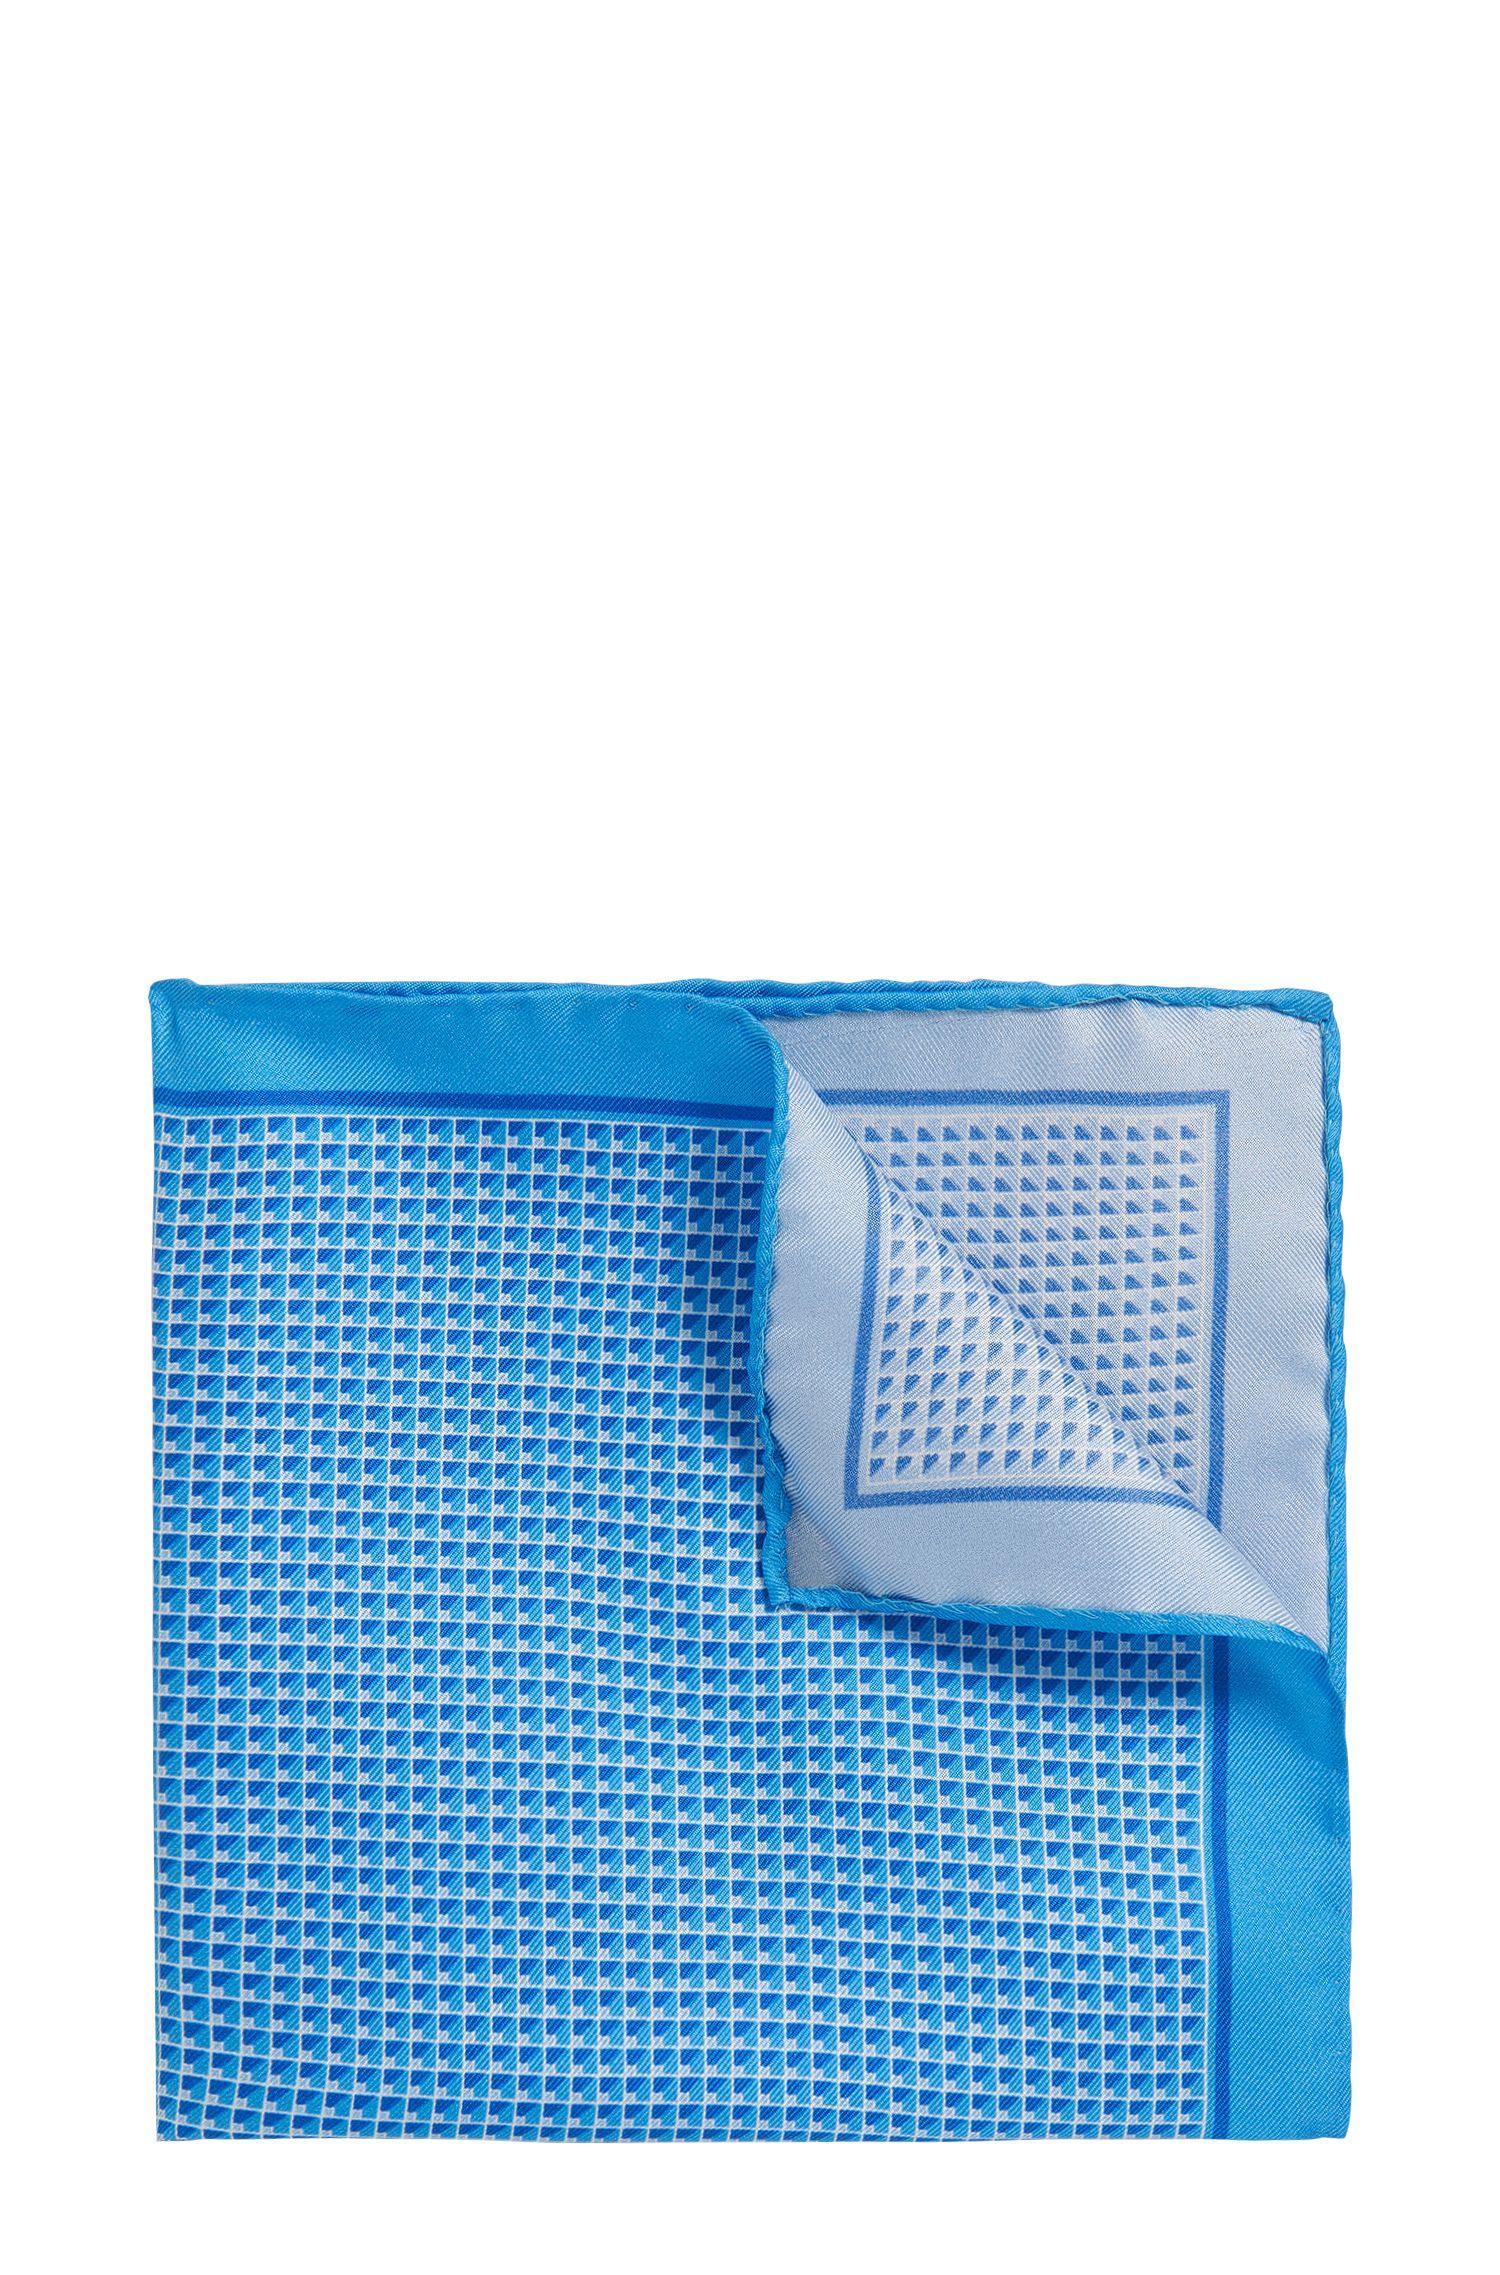 Patterned Italian Silk Twill Pocket Square